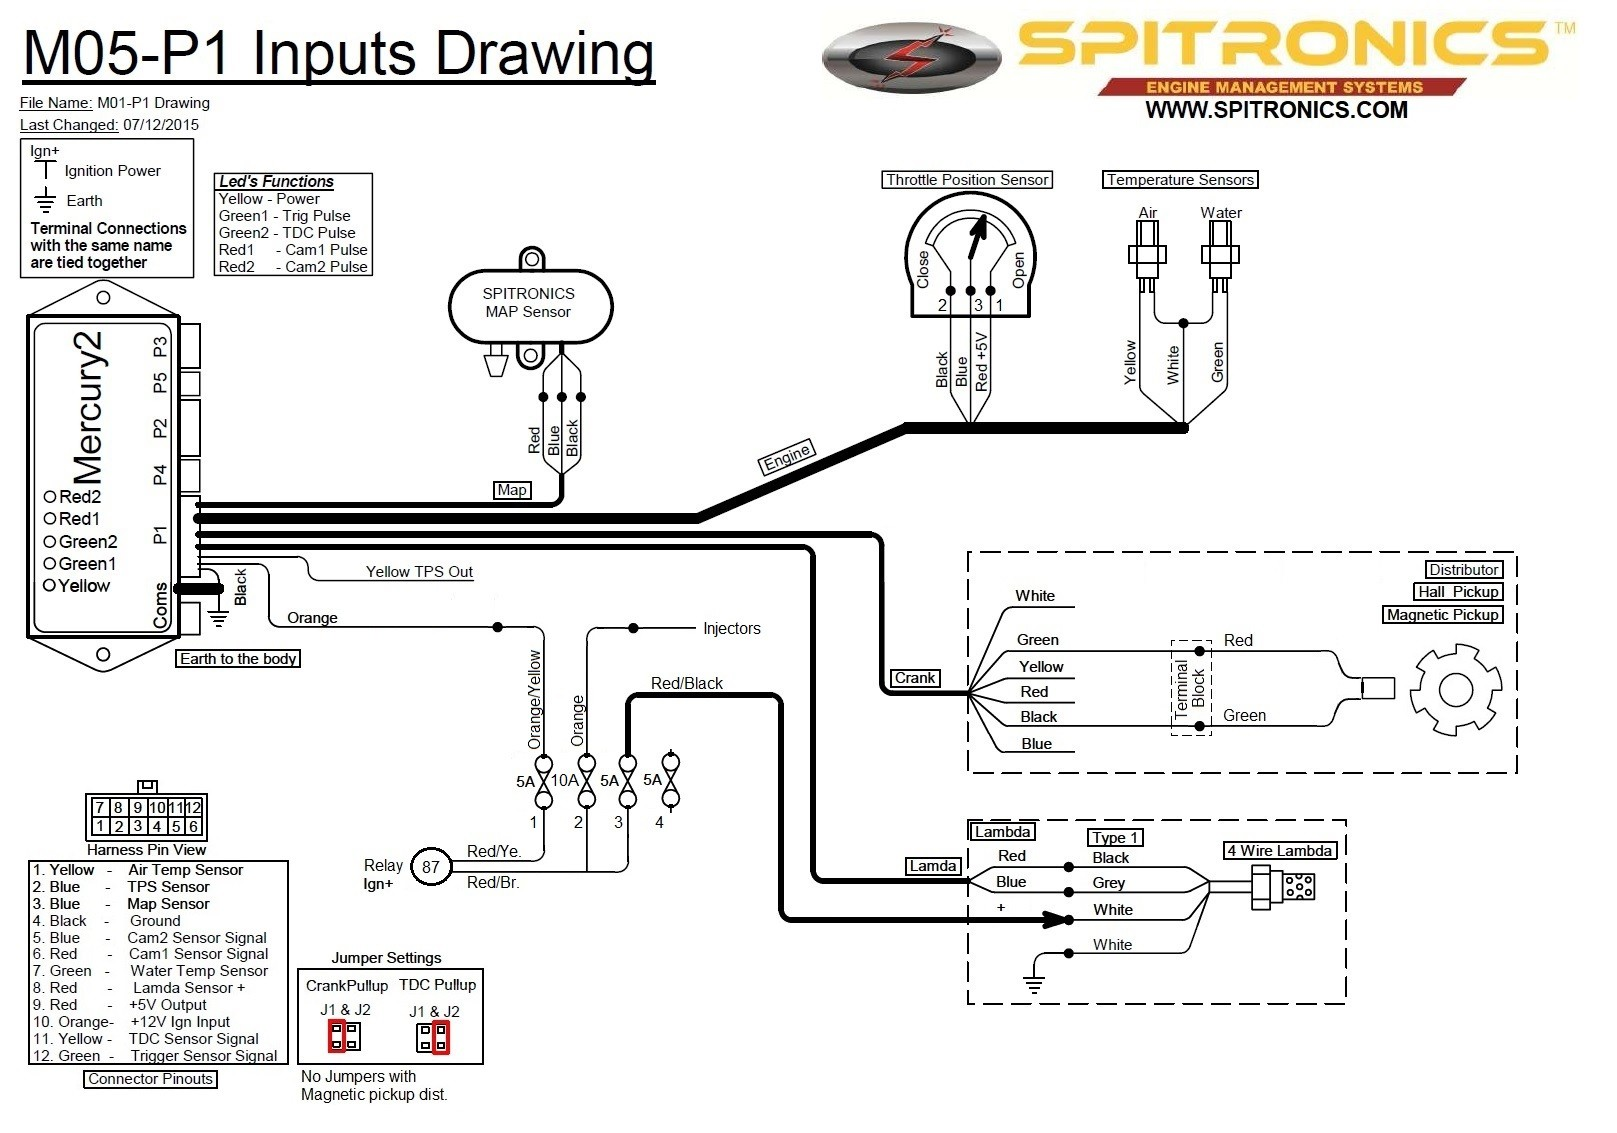 Spitronics orion 2 Wiring Diagram Upgrading A 280z Efi to Spitronics Mercury 2 Ecu Page 2 Fuel Injection the Classic Zcar Club Of Spitronics orion 2 Wiring Diagram